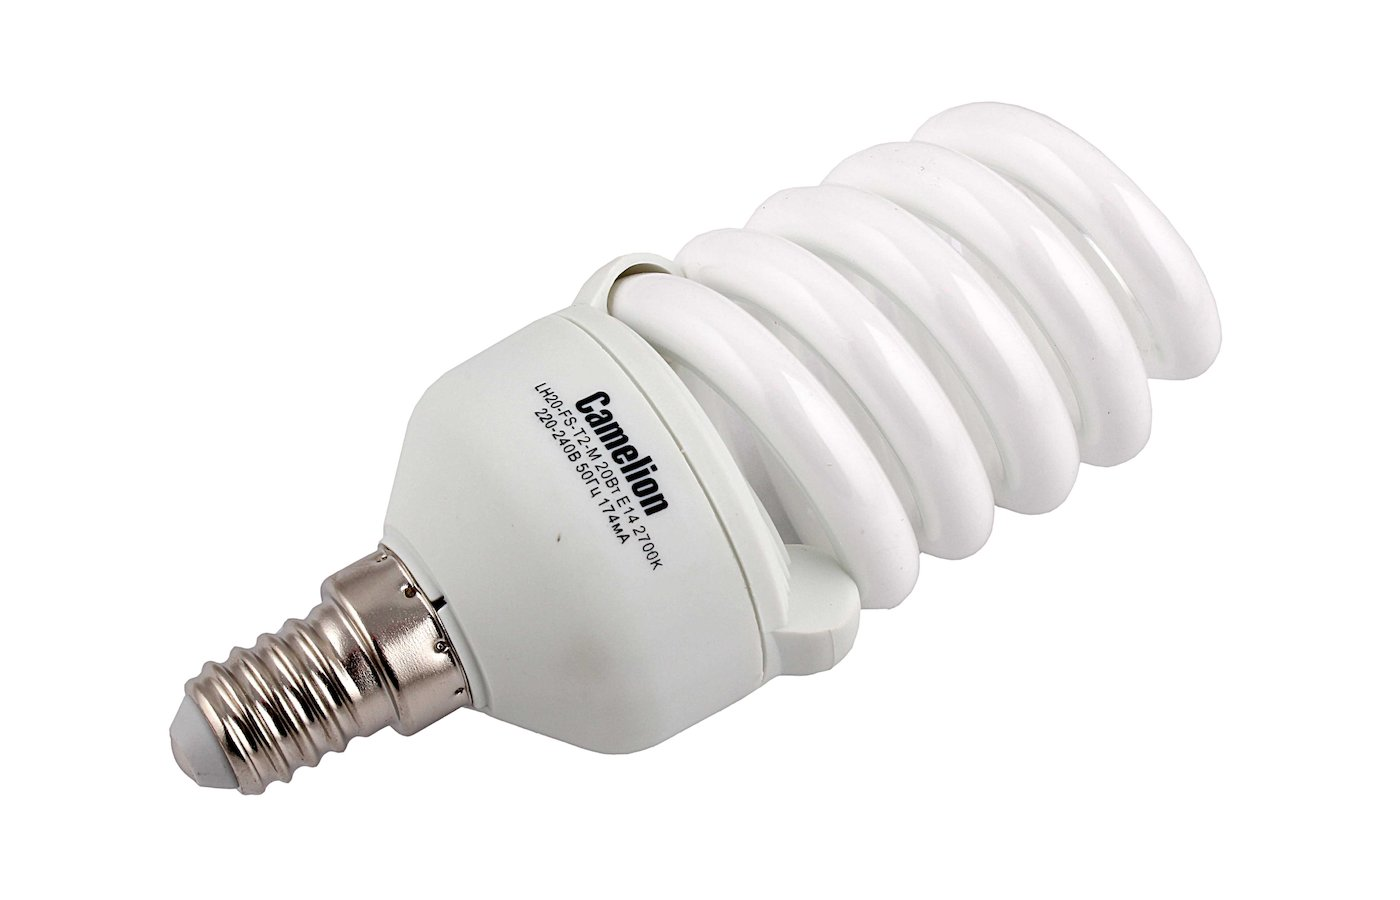 Лампочки энергосберегающие Camelion LH20-FS-T2-M/827/E14 (энергосбер.лампа 20Вт 220В)